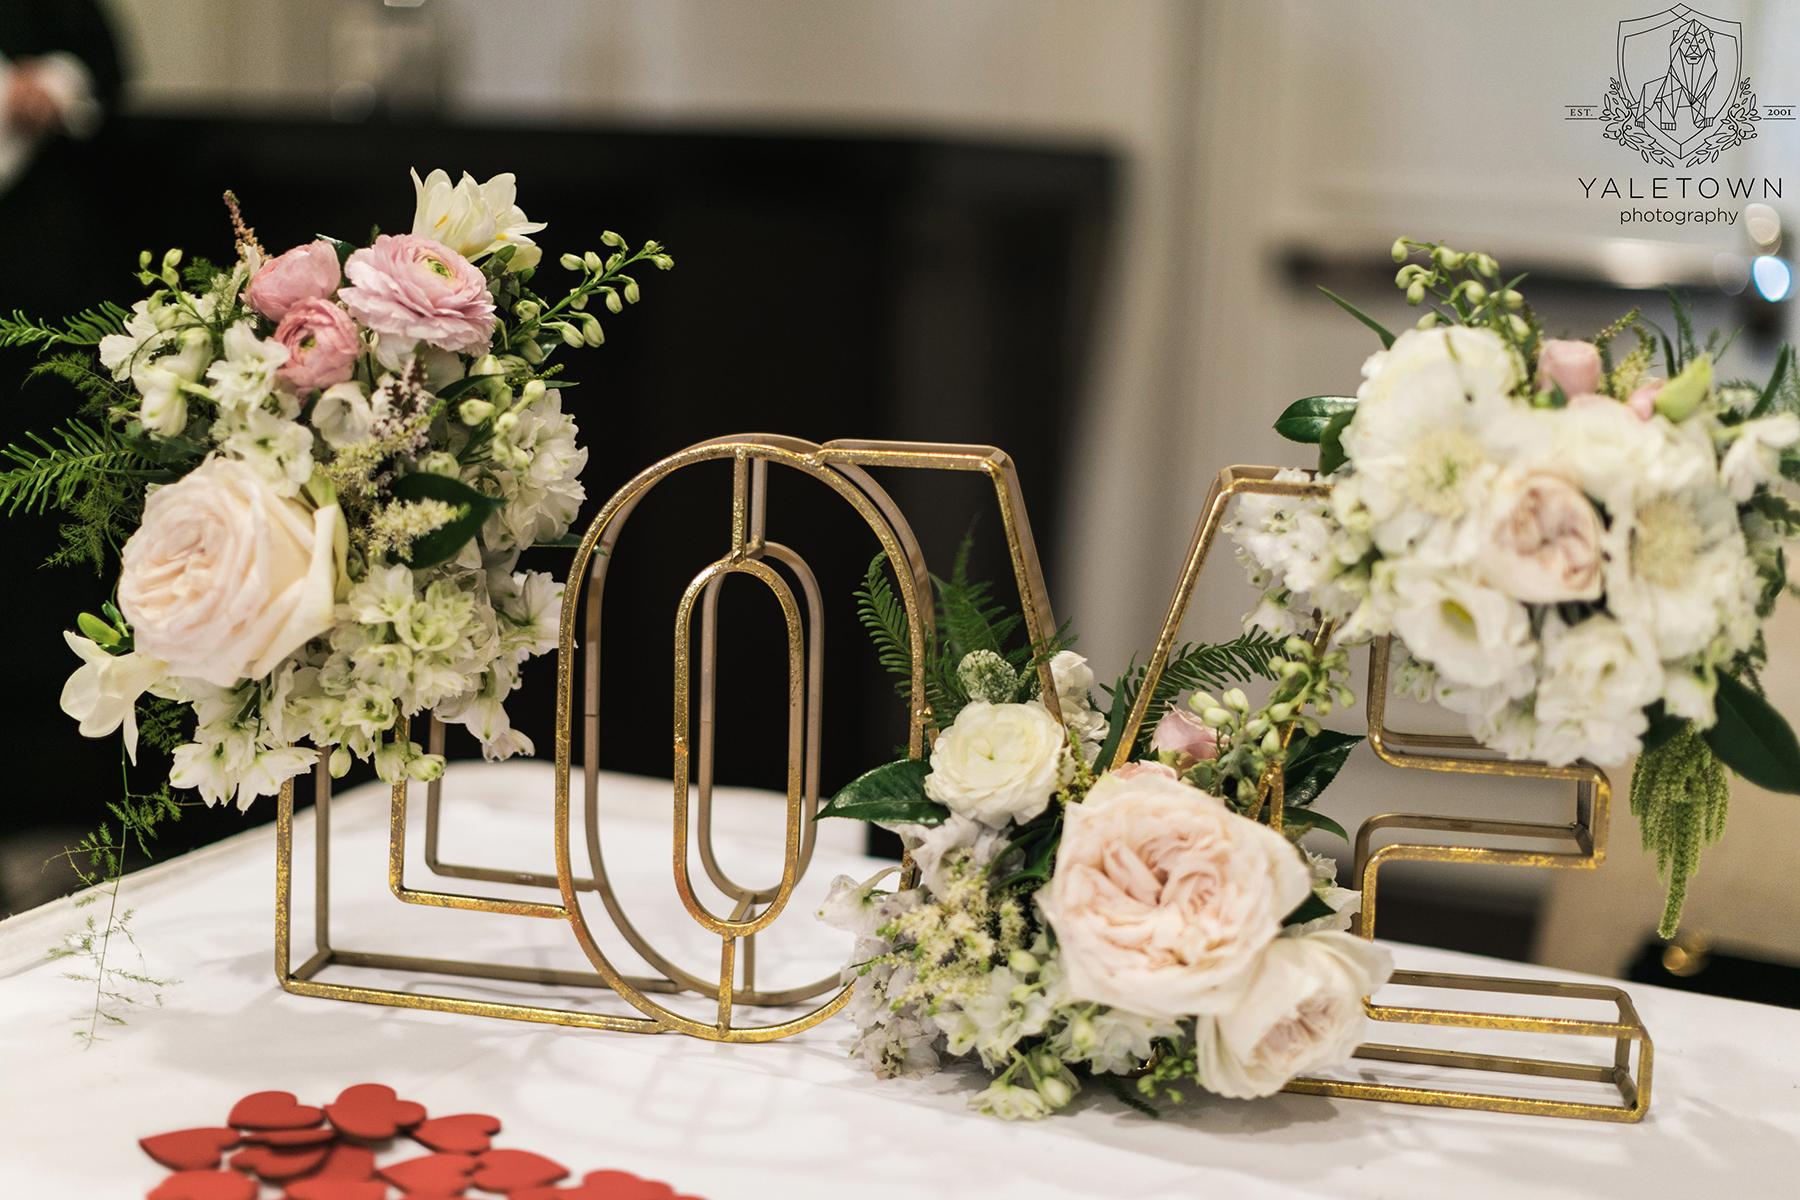 Wedding-Details-Floral-Arrangements-Rosewood-Hotel-Georgia-Vancouver-Wedding-Yaletown-Photography-photo